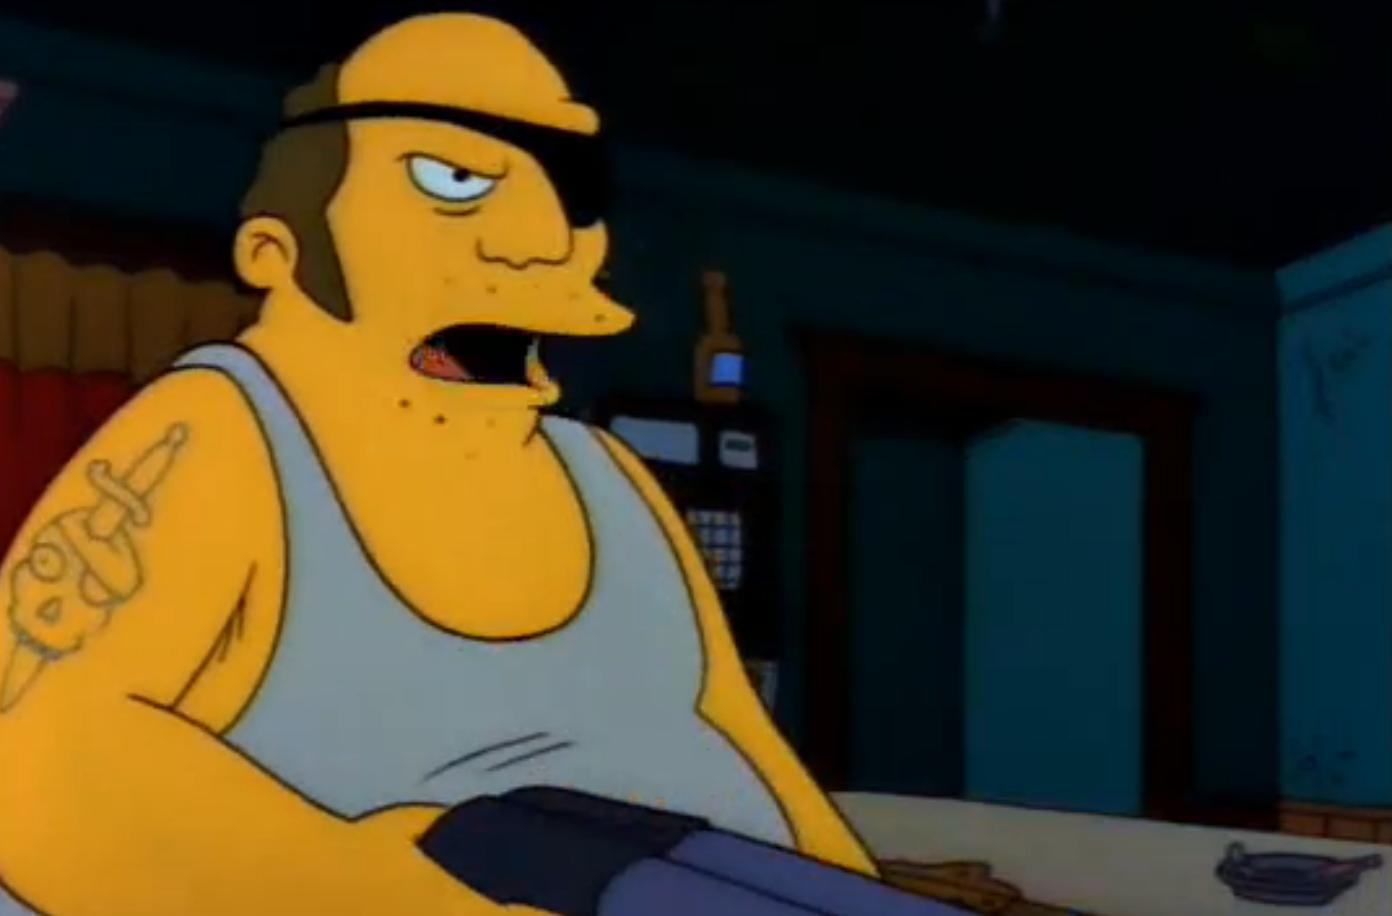 The Aristocrat's Bartender